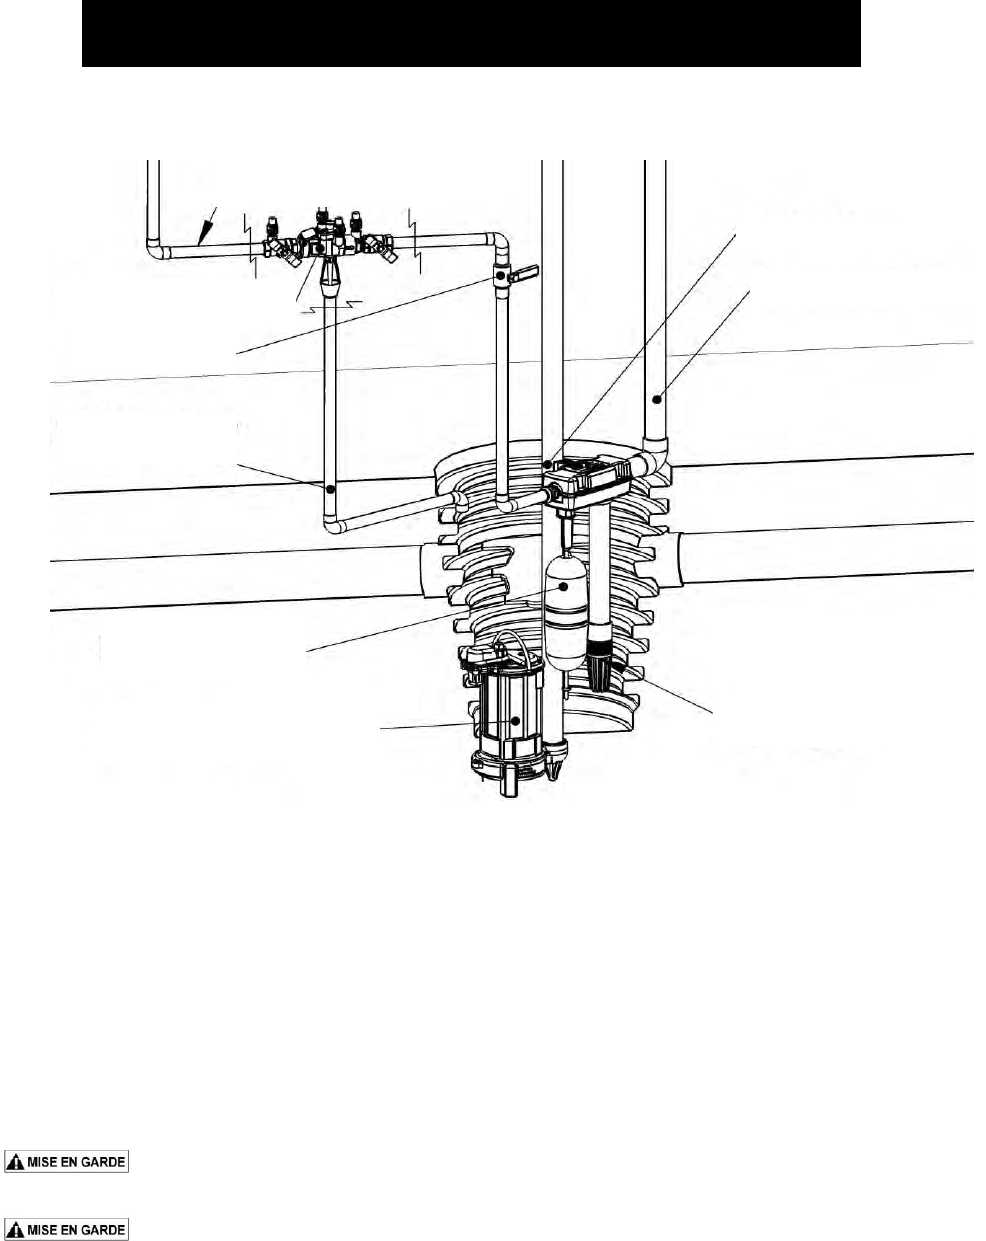 145 2 Liberty Sj10 Instructions User Manual Pump Wiring Diagram Copyright 2012 Pumps Inc Tous Droits Rservs